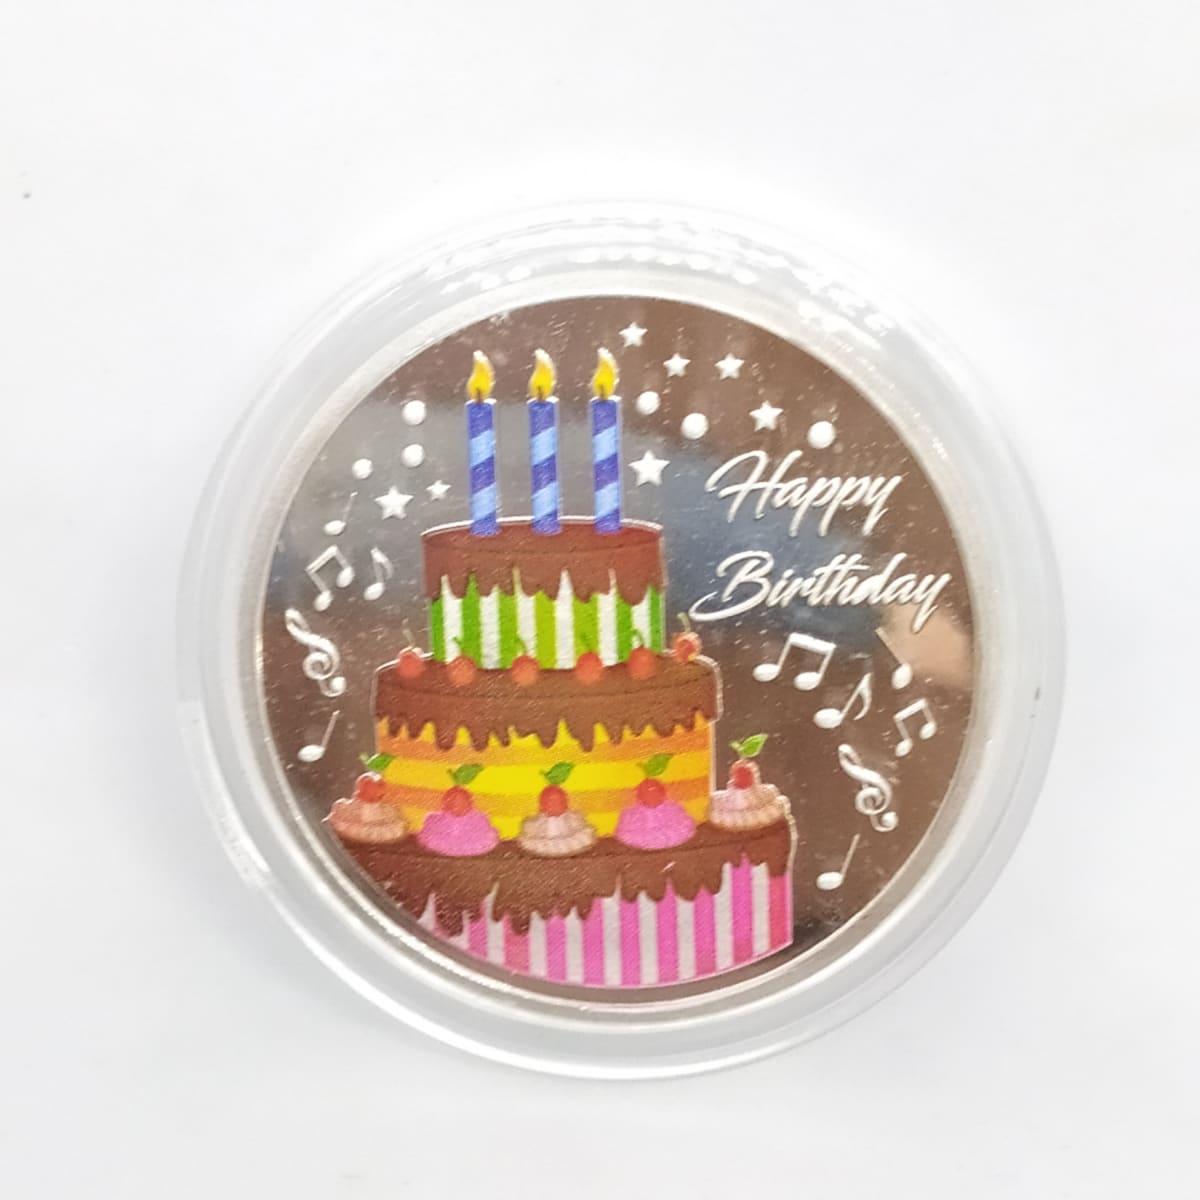 Happy Birthday Silver Coin